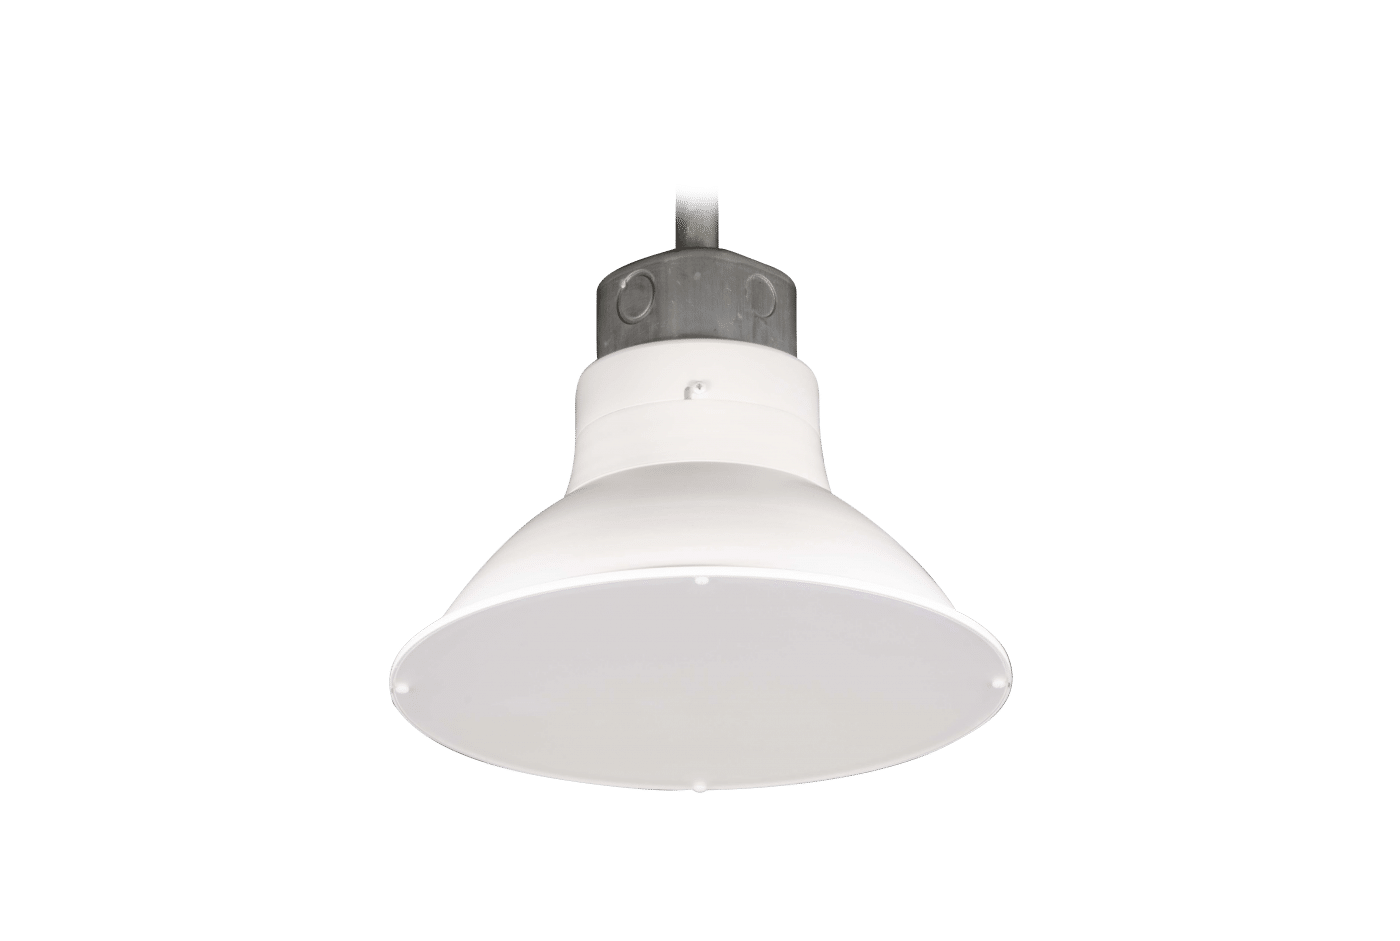 R-Series Reflective Luminaire AC & Reflective Luminaire LED Fixtures (R-Series)Silescent Lighting ... azcodes.com